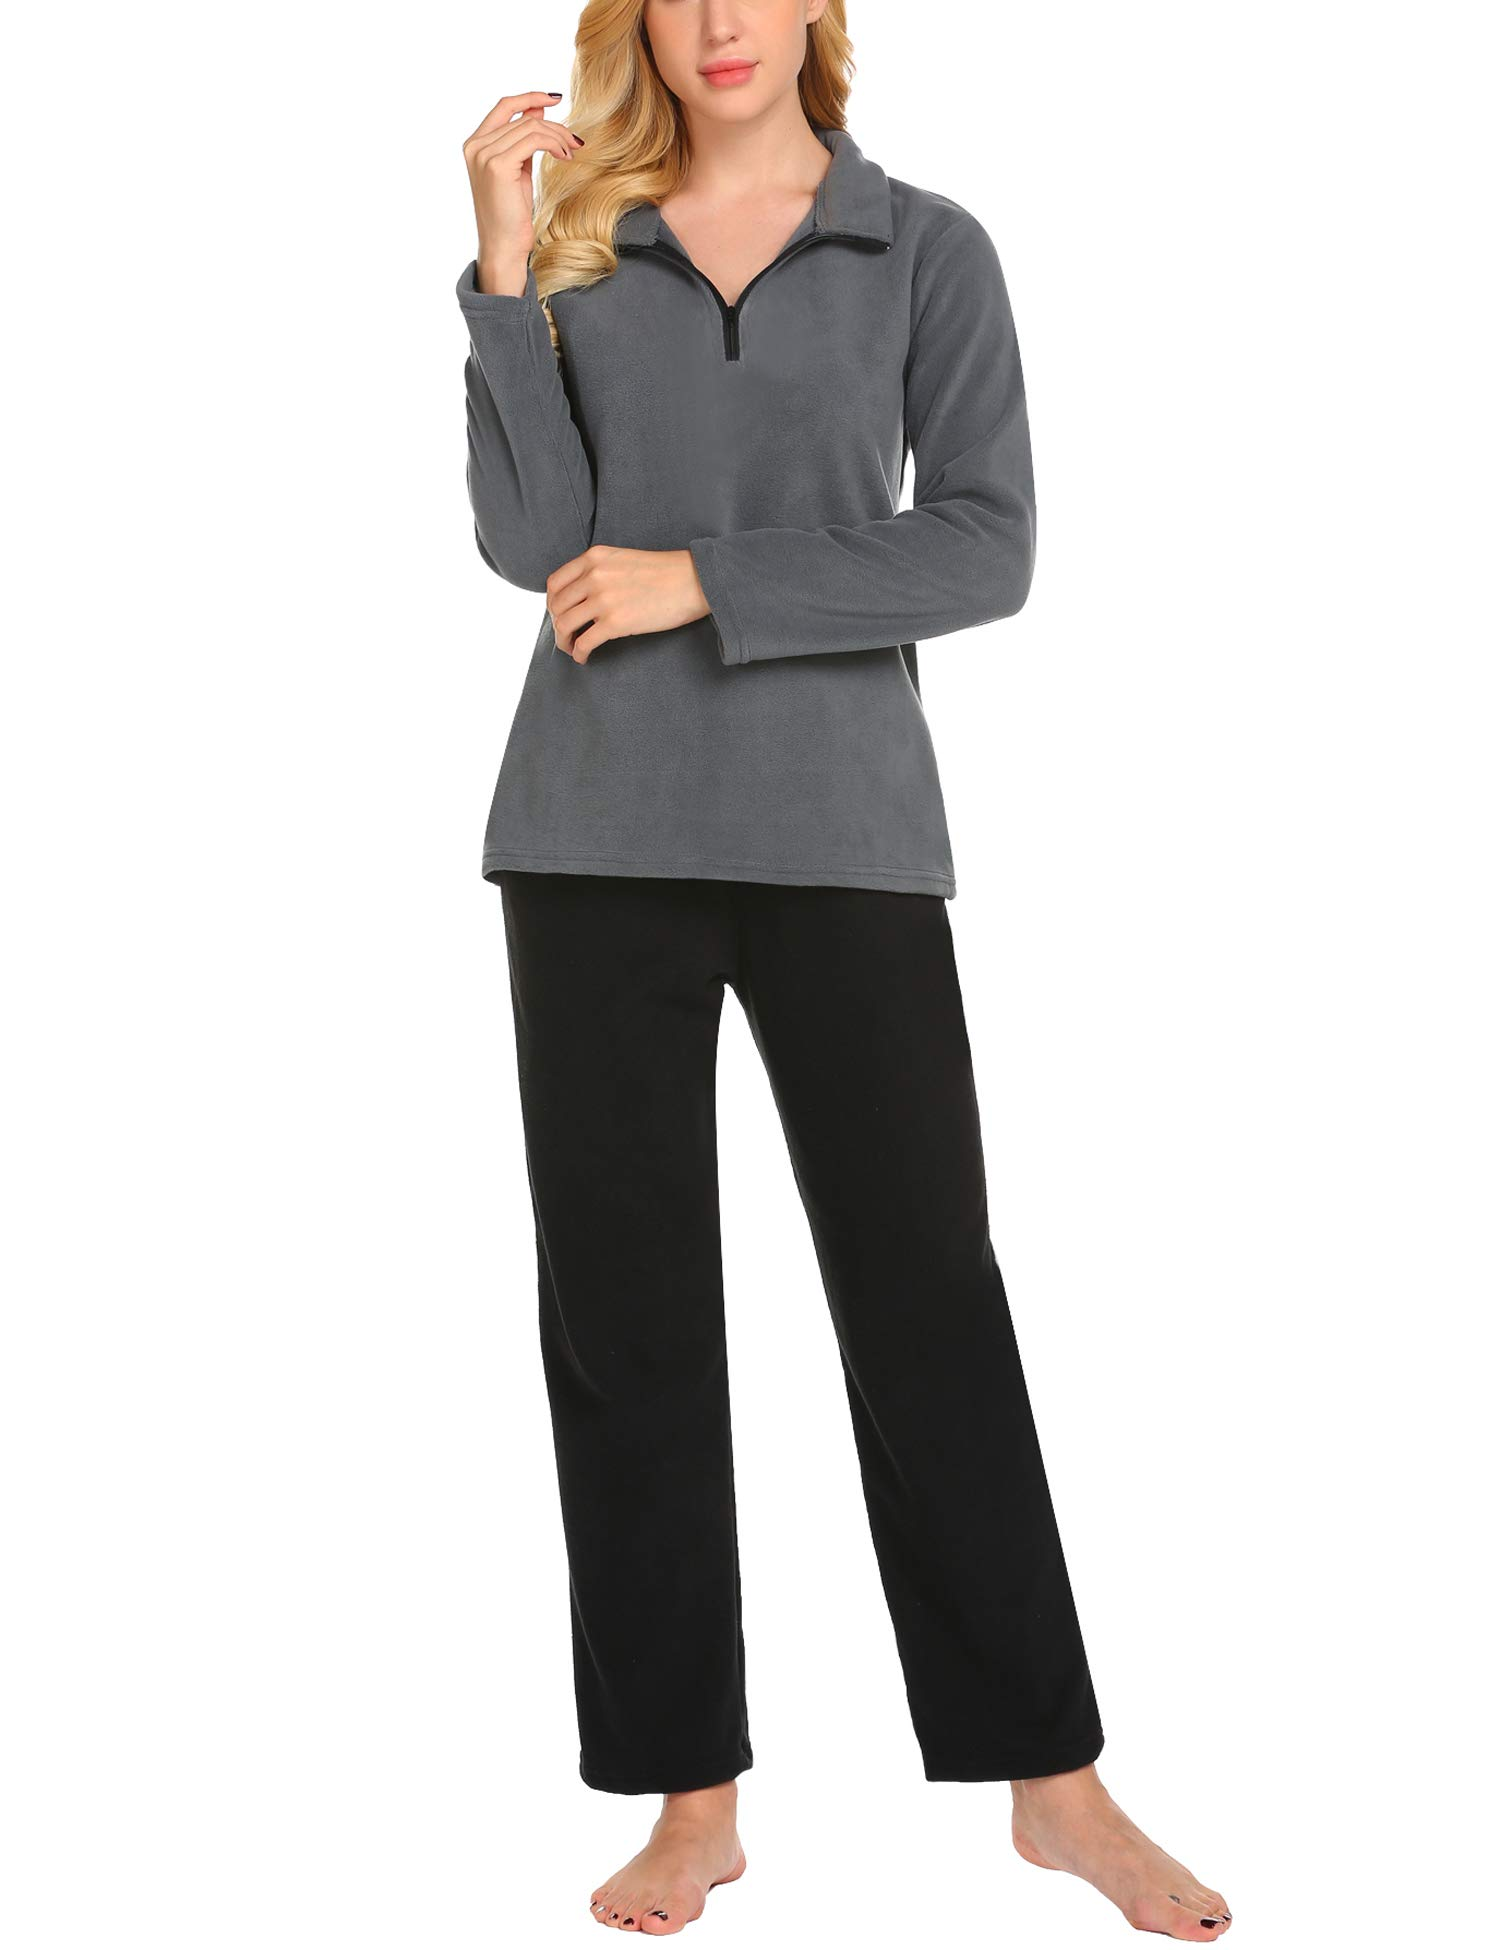 Hotouch Women's Loungewear Plush Cozy Fleece Pajamas Set S-XXL